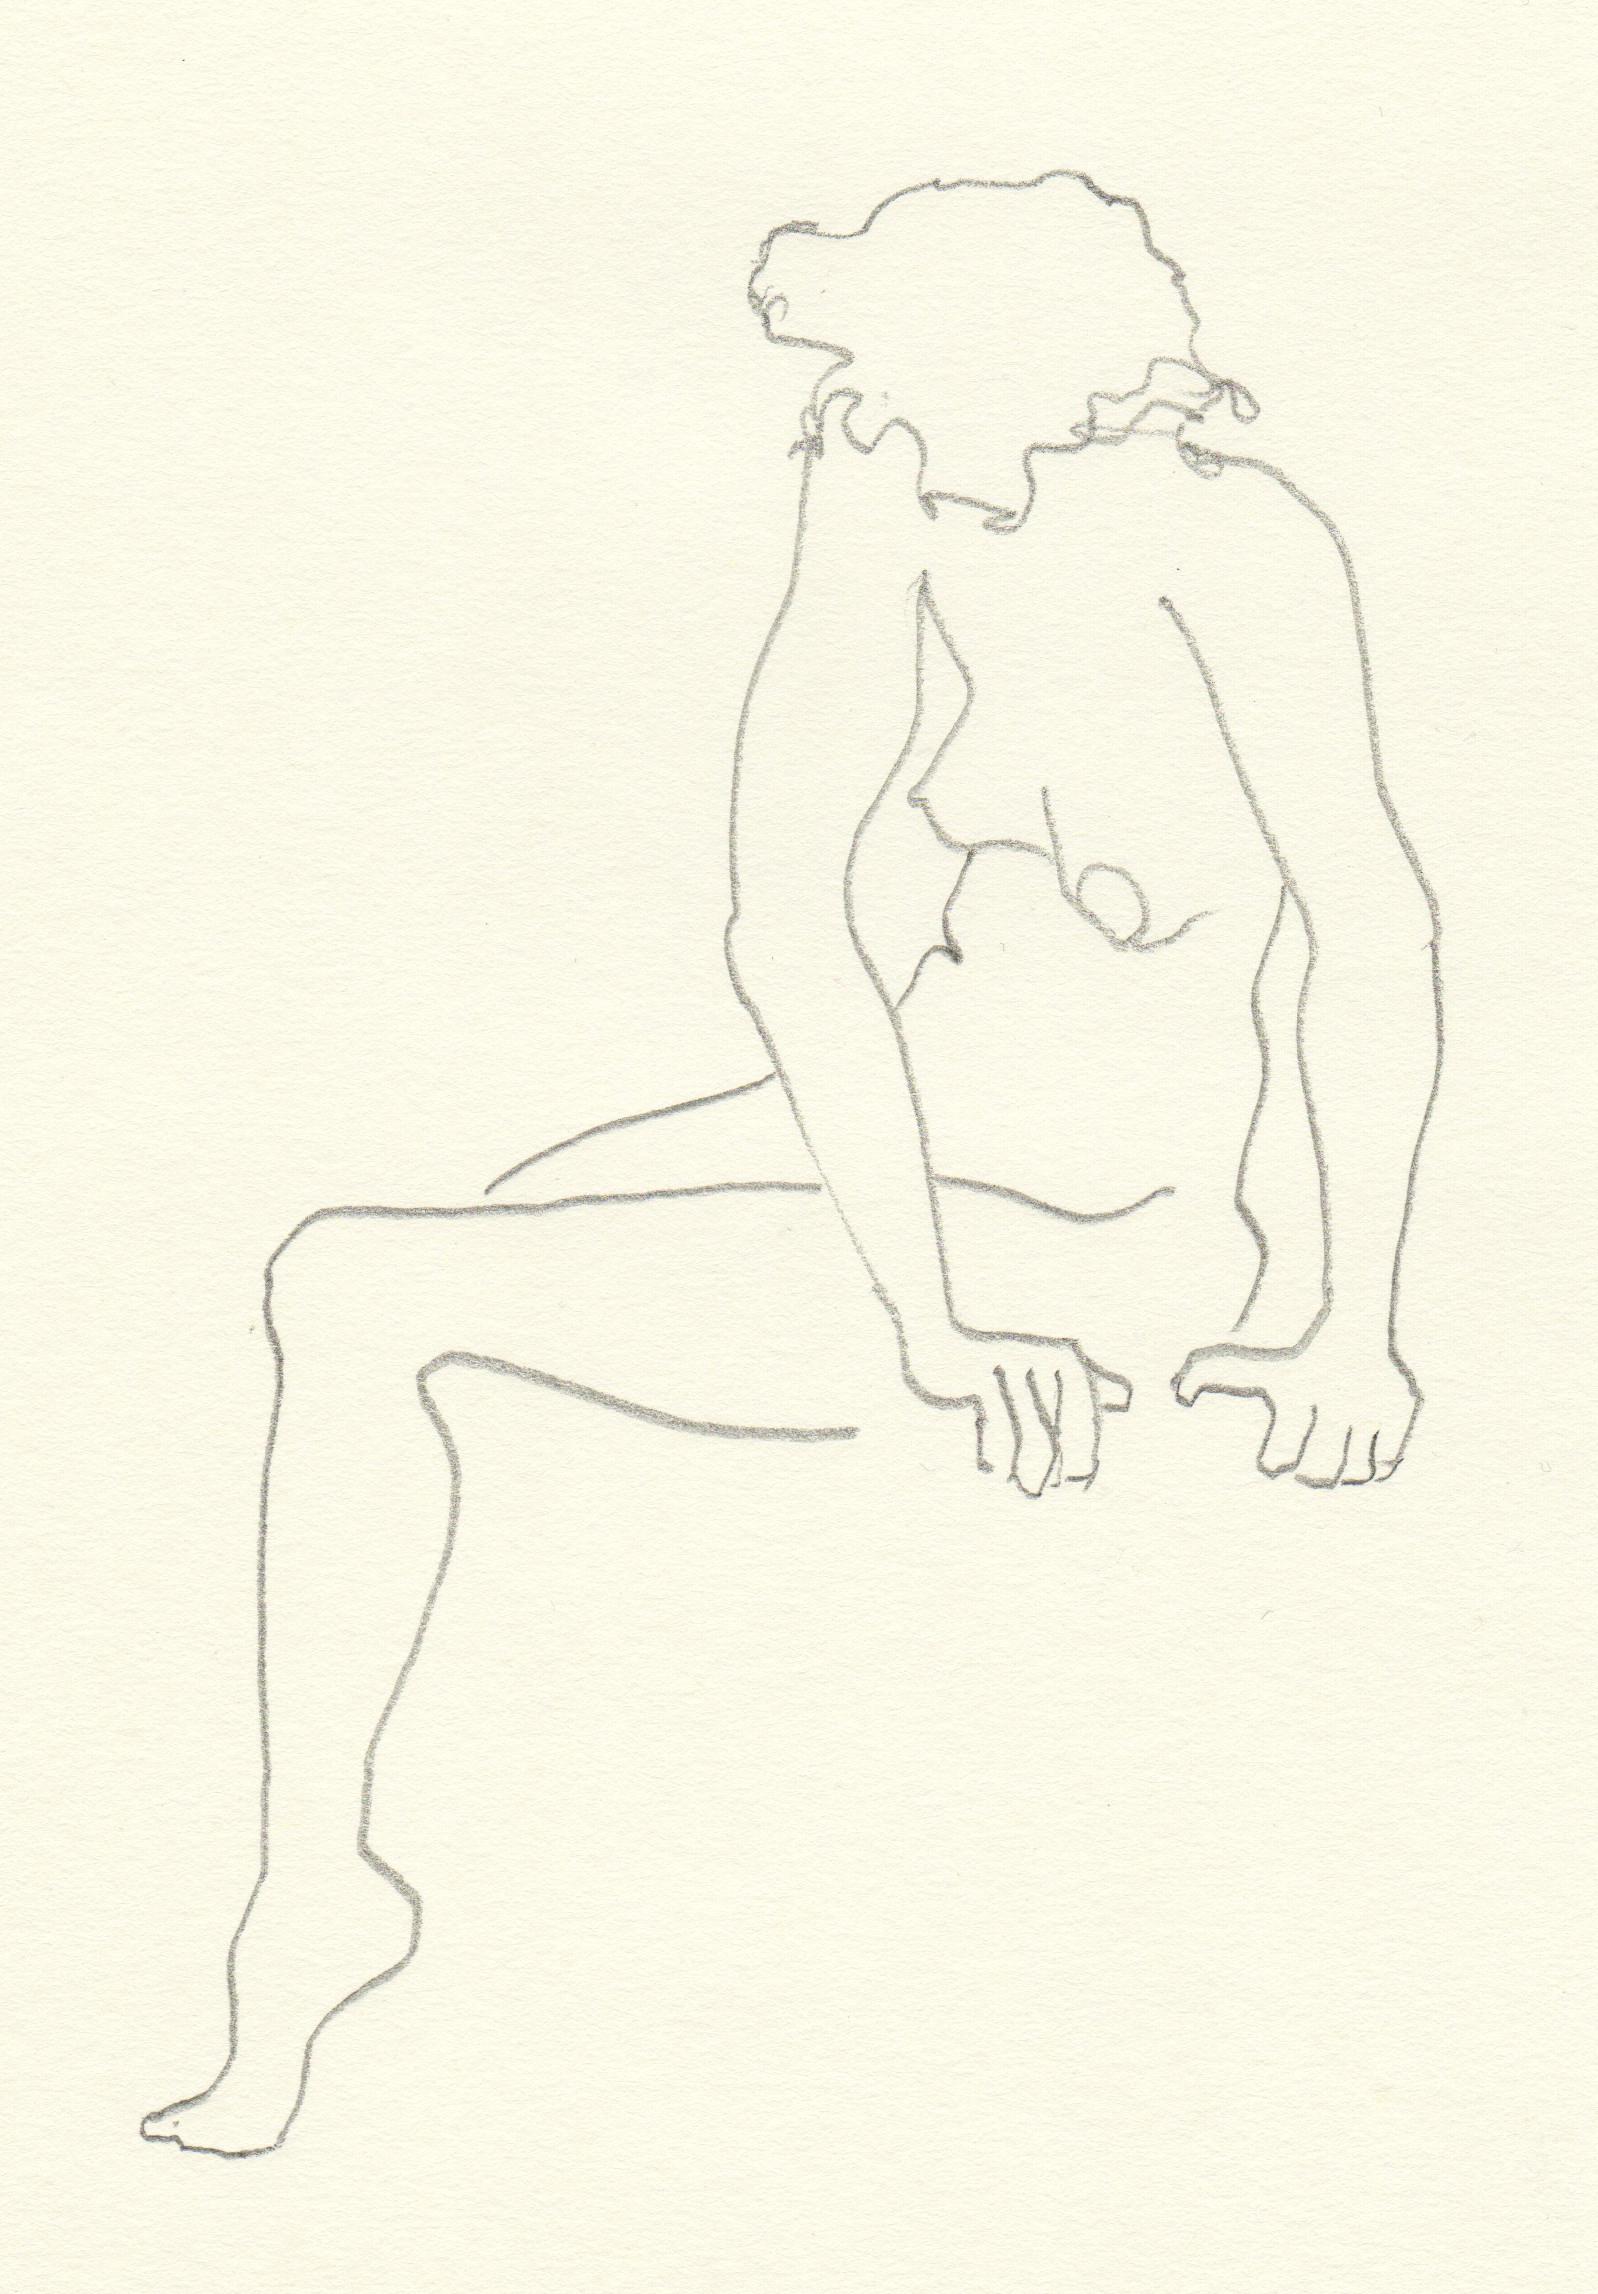 2012_Sketch_F-Beudin_042